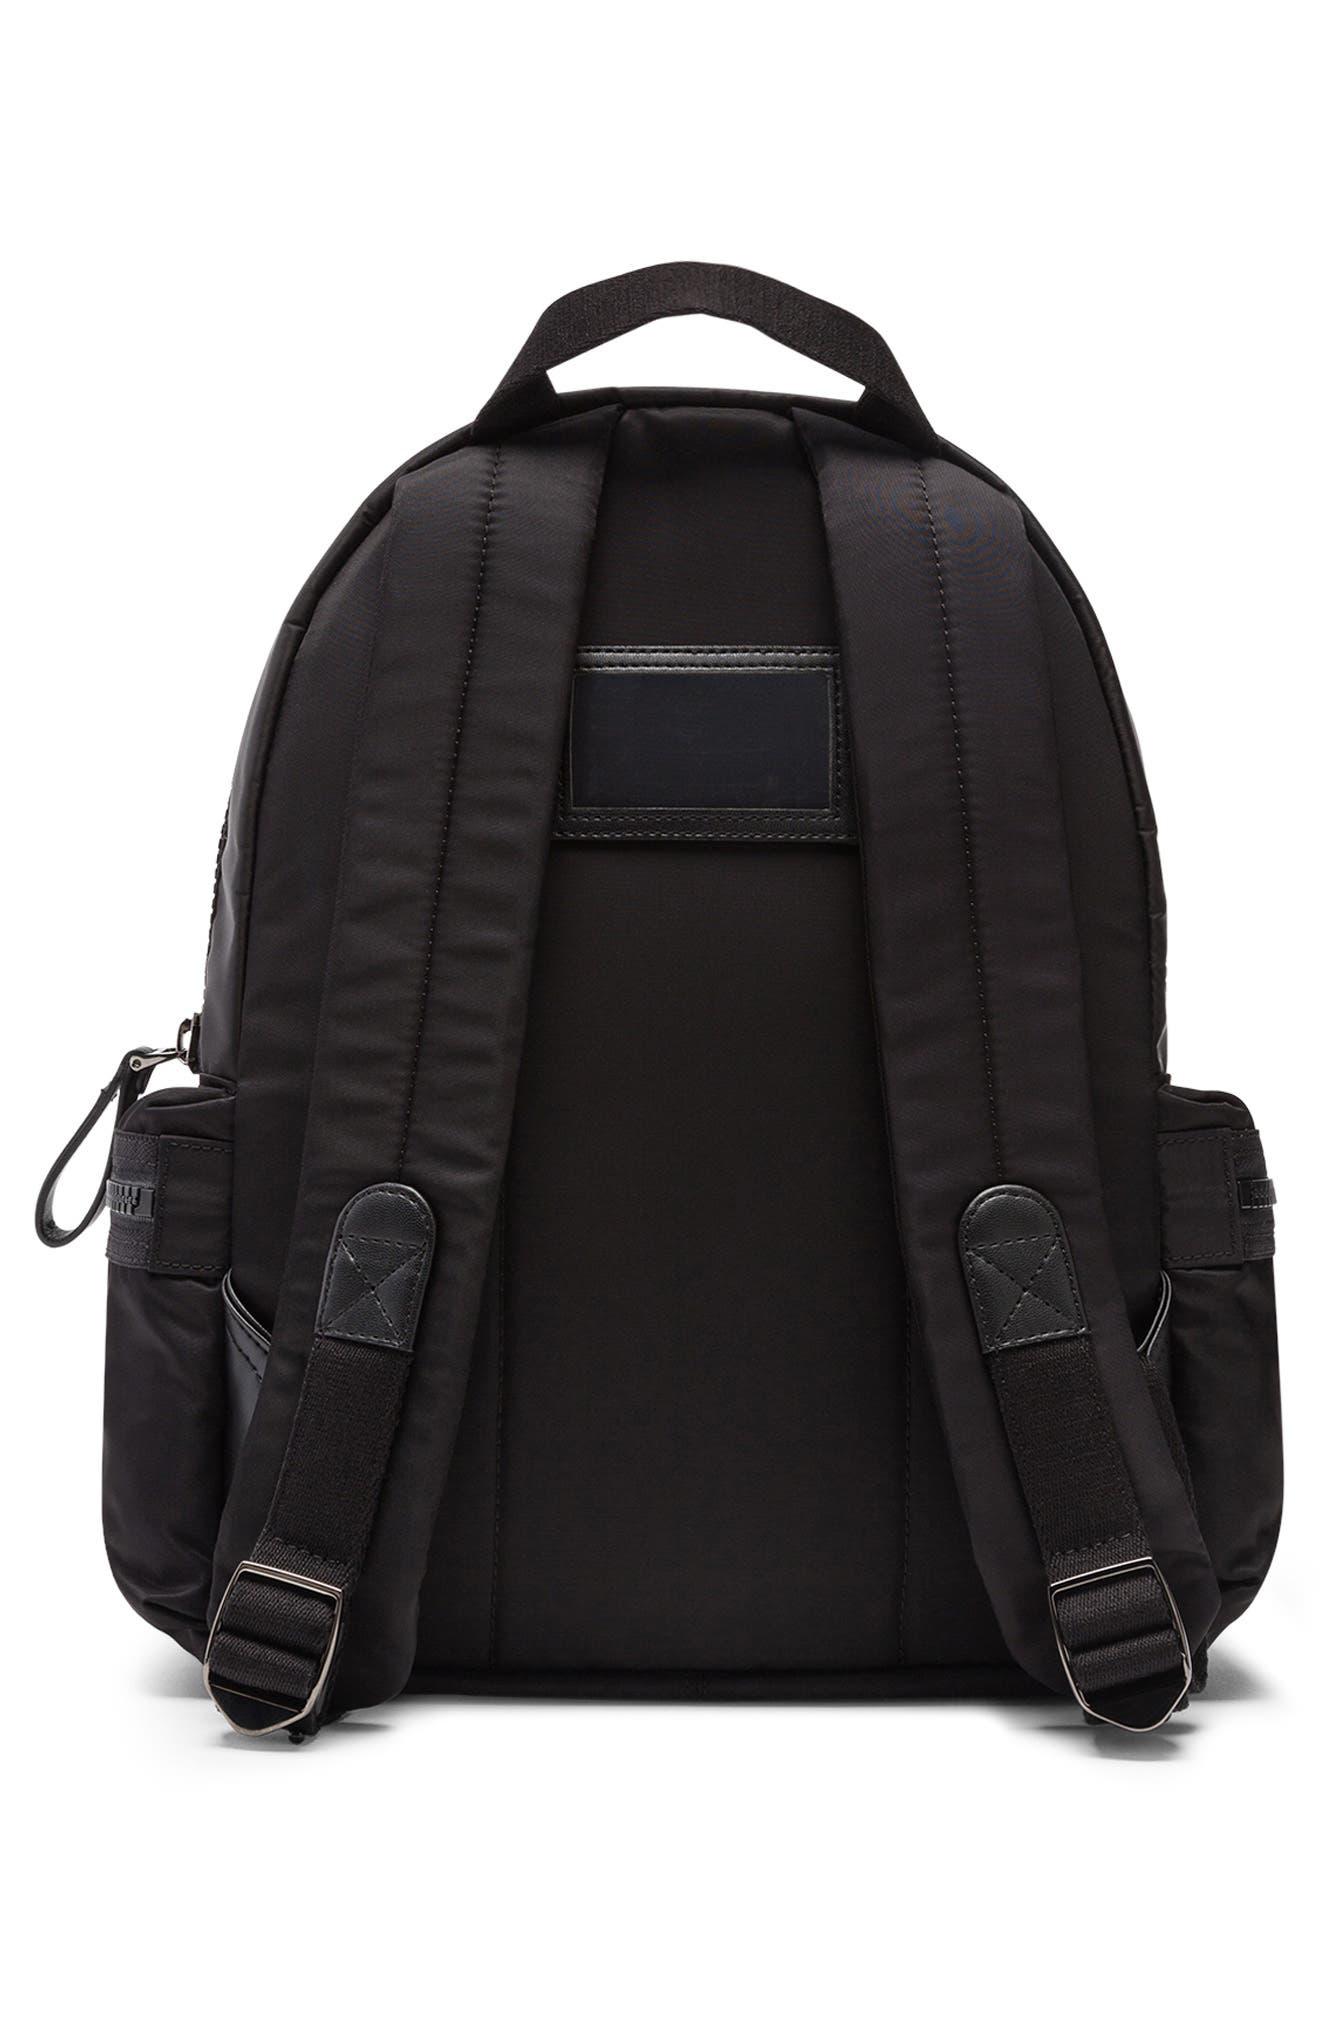 Zaino Nylon Backpack,                             Alternate thumbnail 2, color,                             NERO/ NERO